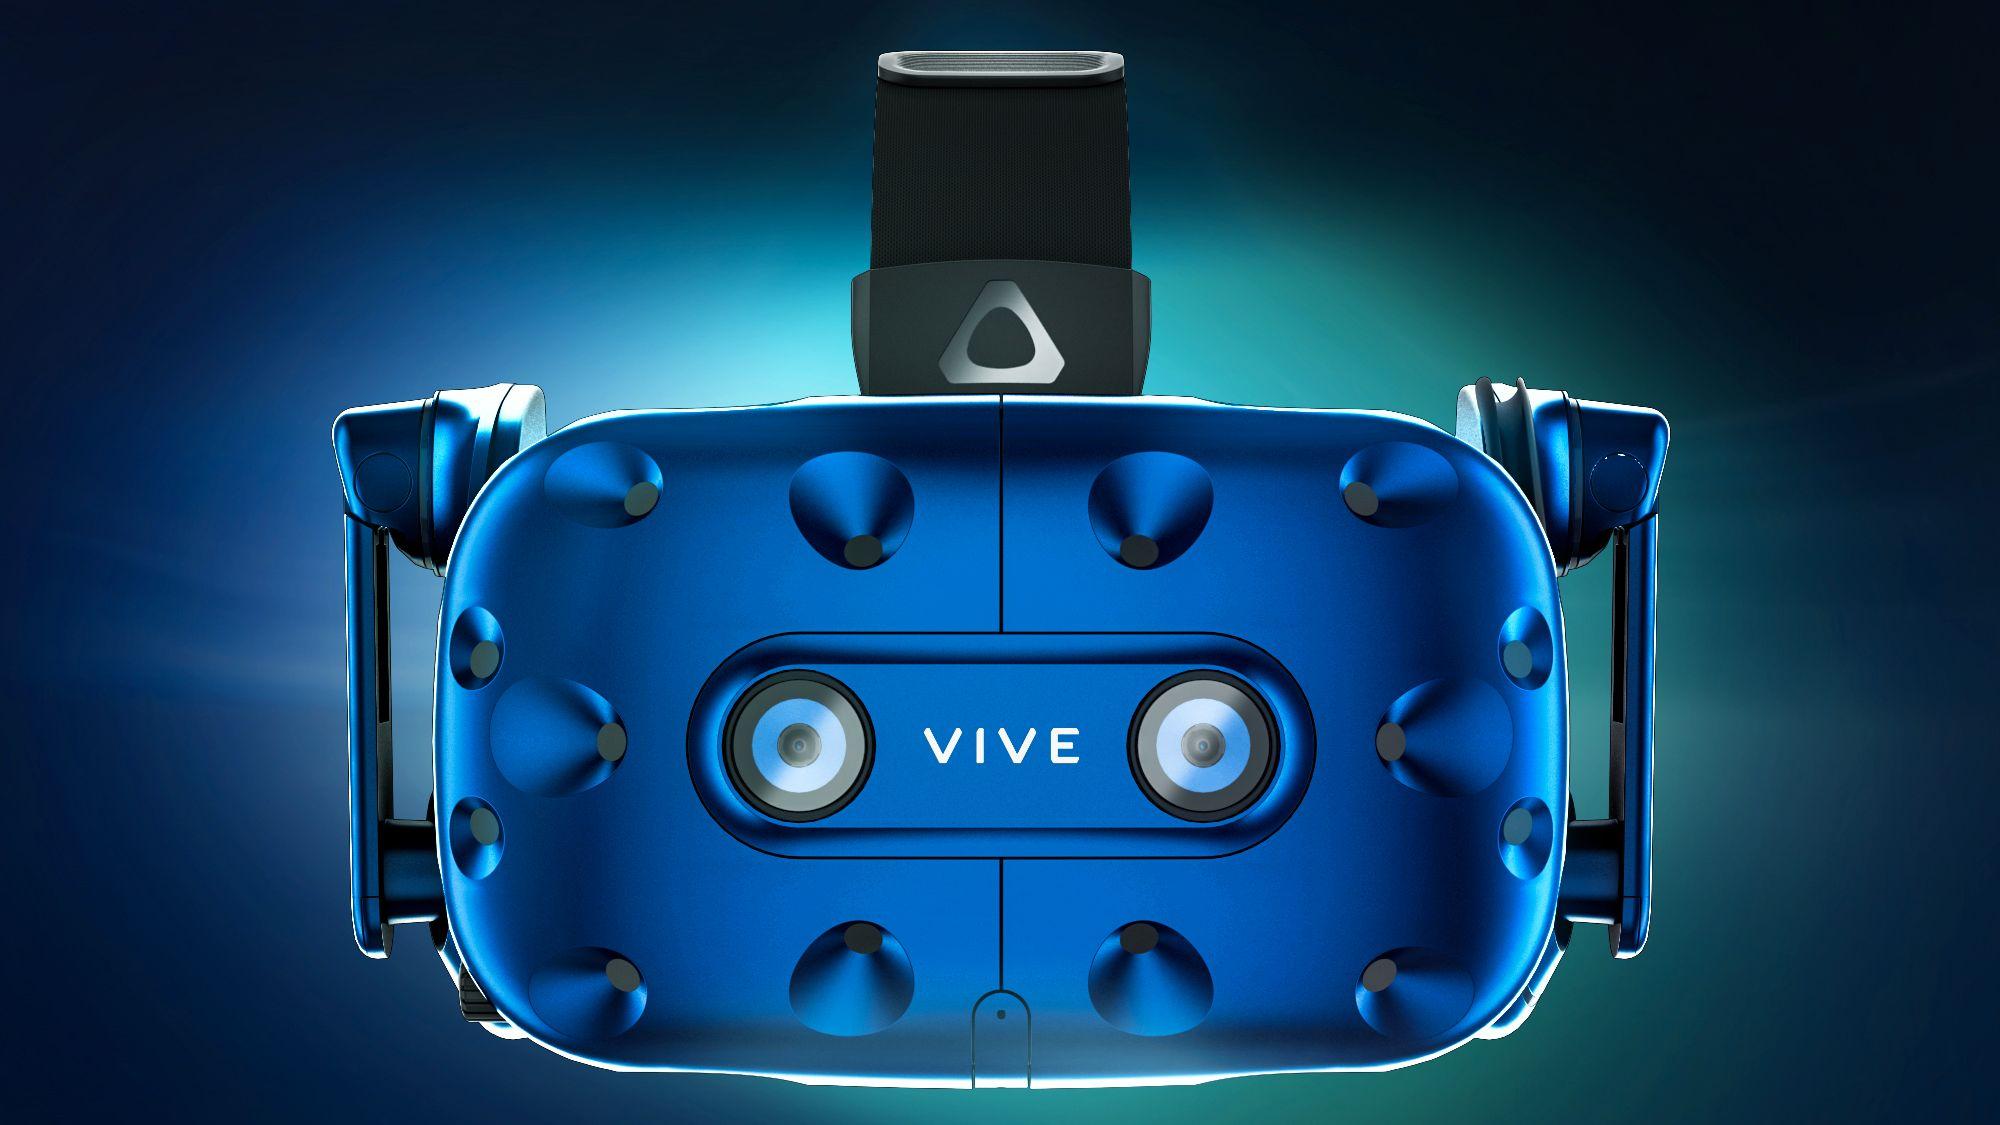 Nå er prisen på nye HTC Vive Pro klar